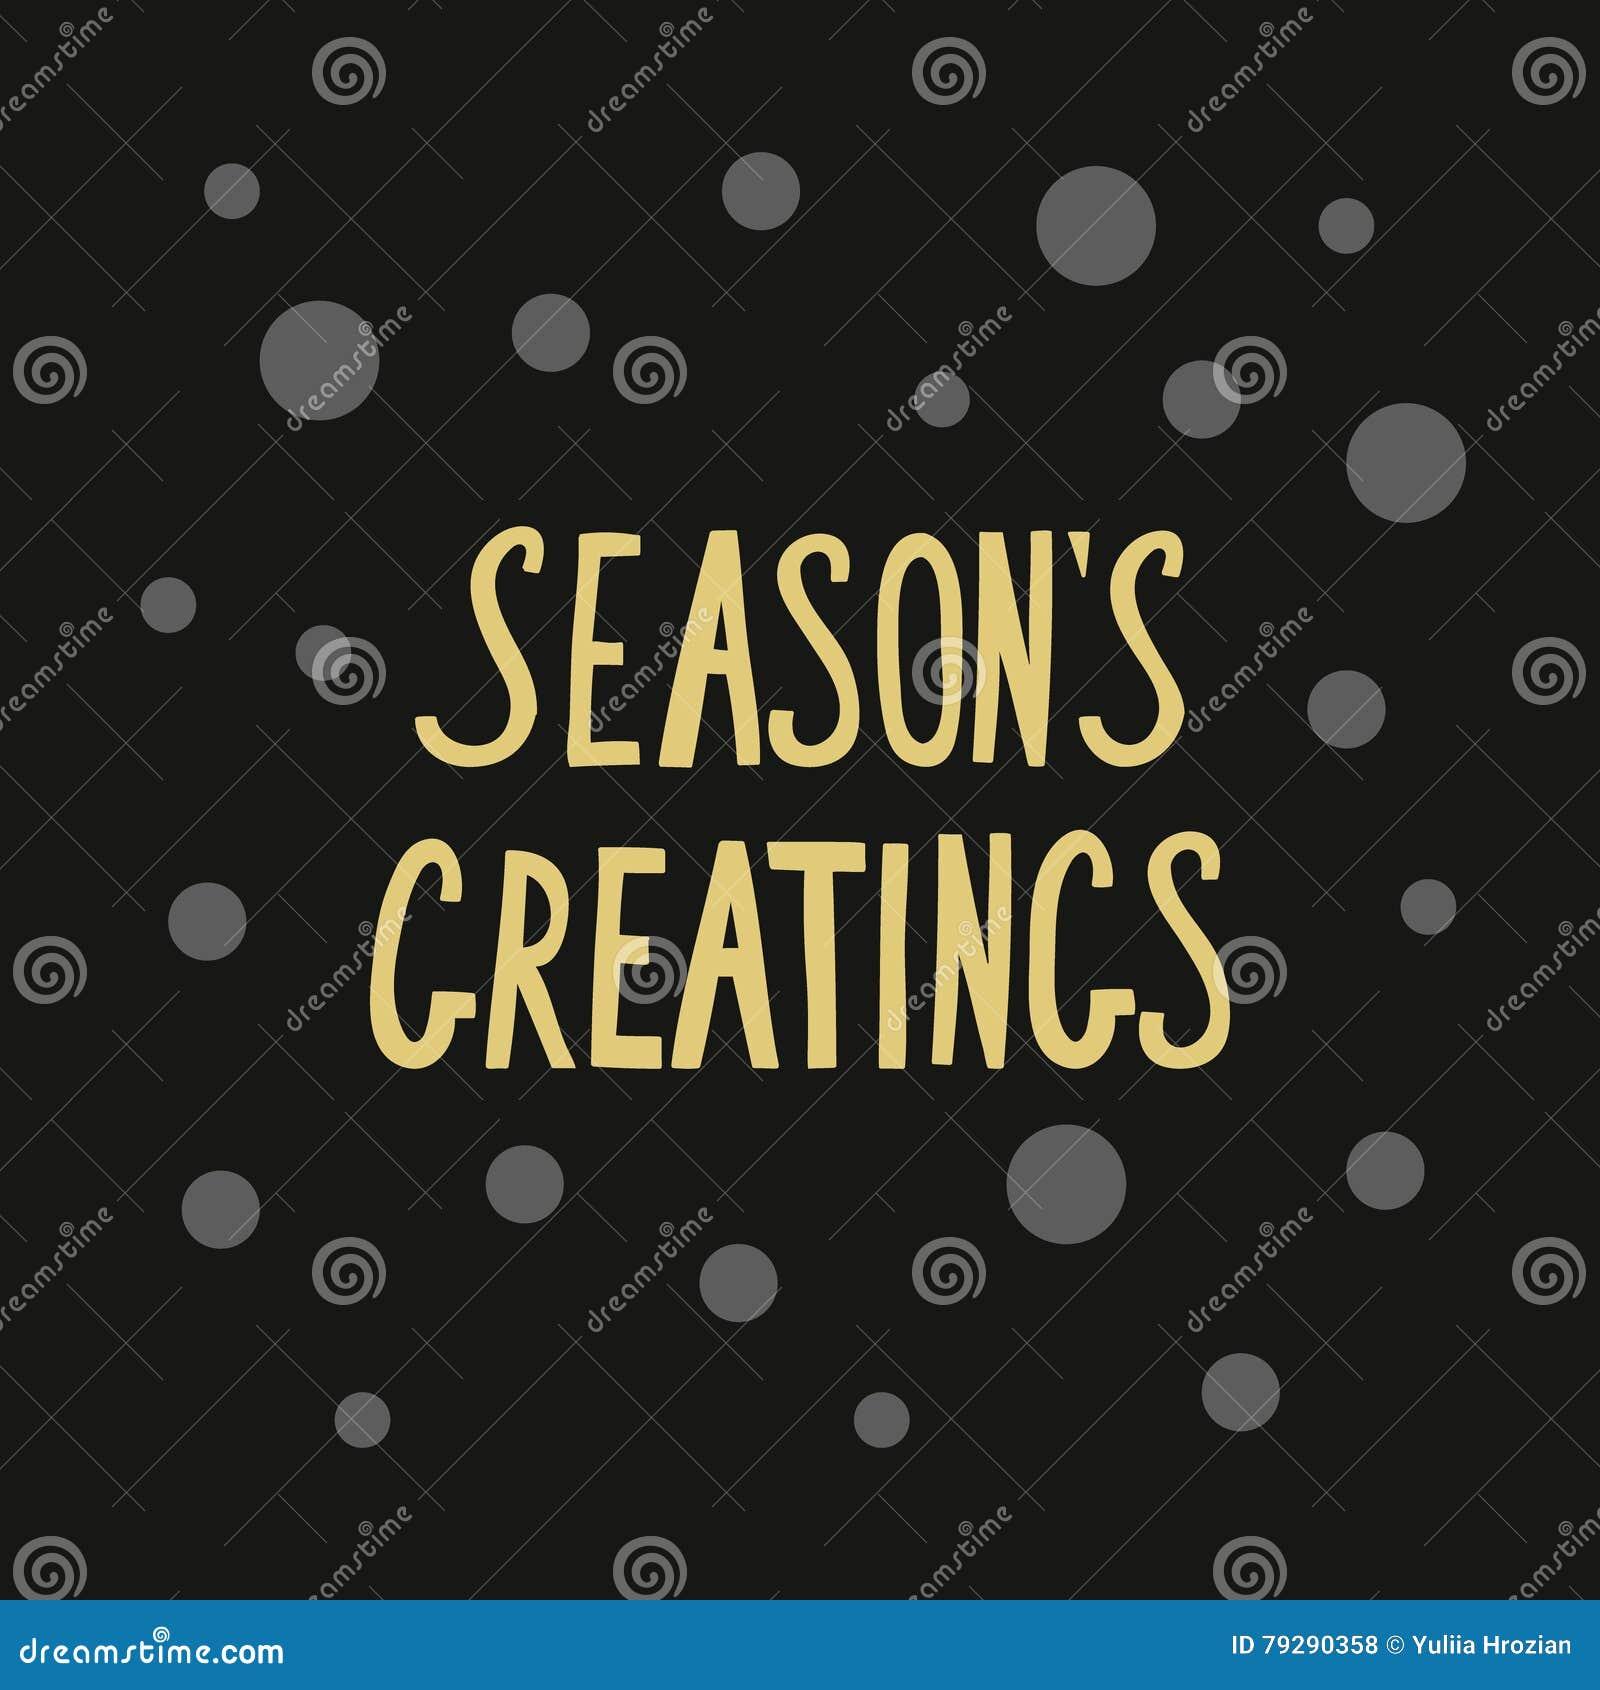 Calligraphic golden phrase seasons greetings for card or banner calligraphic golden phrase seasons greetings for card or banner kristyandbryce Choice Image